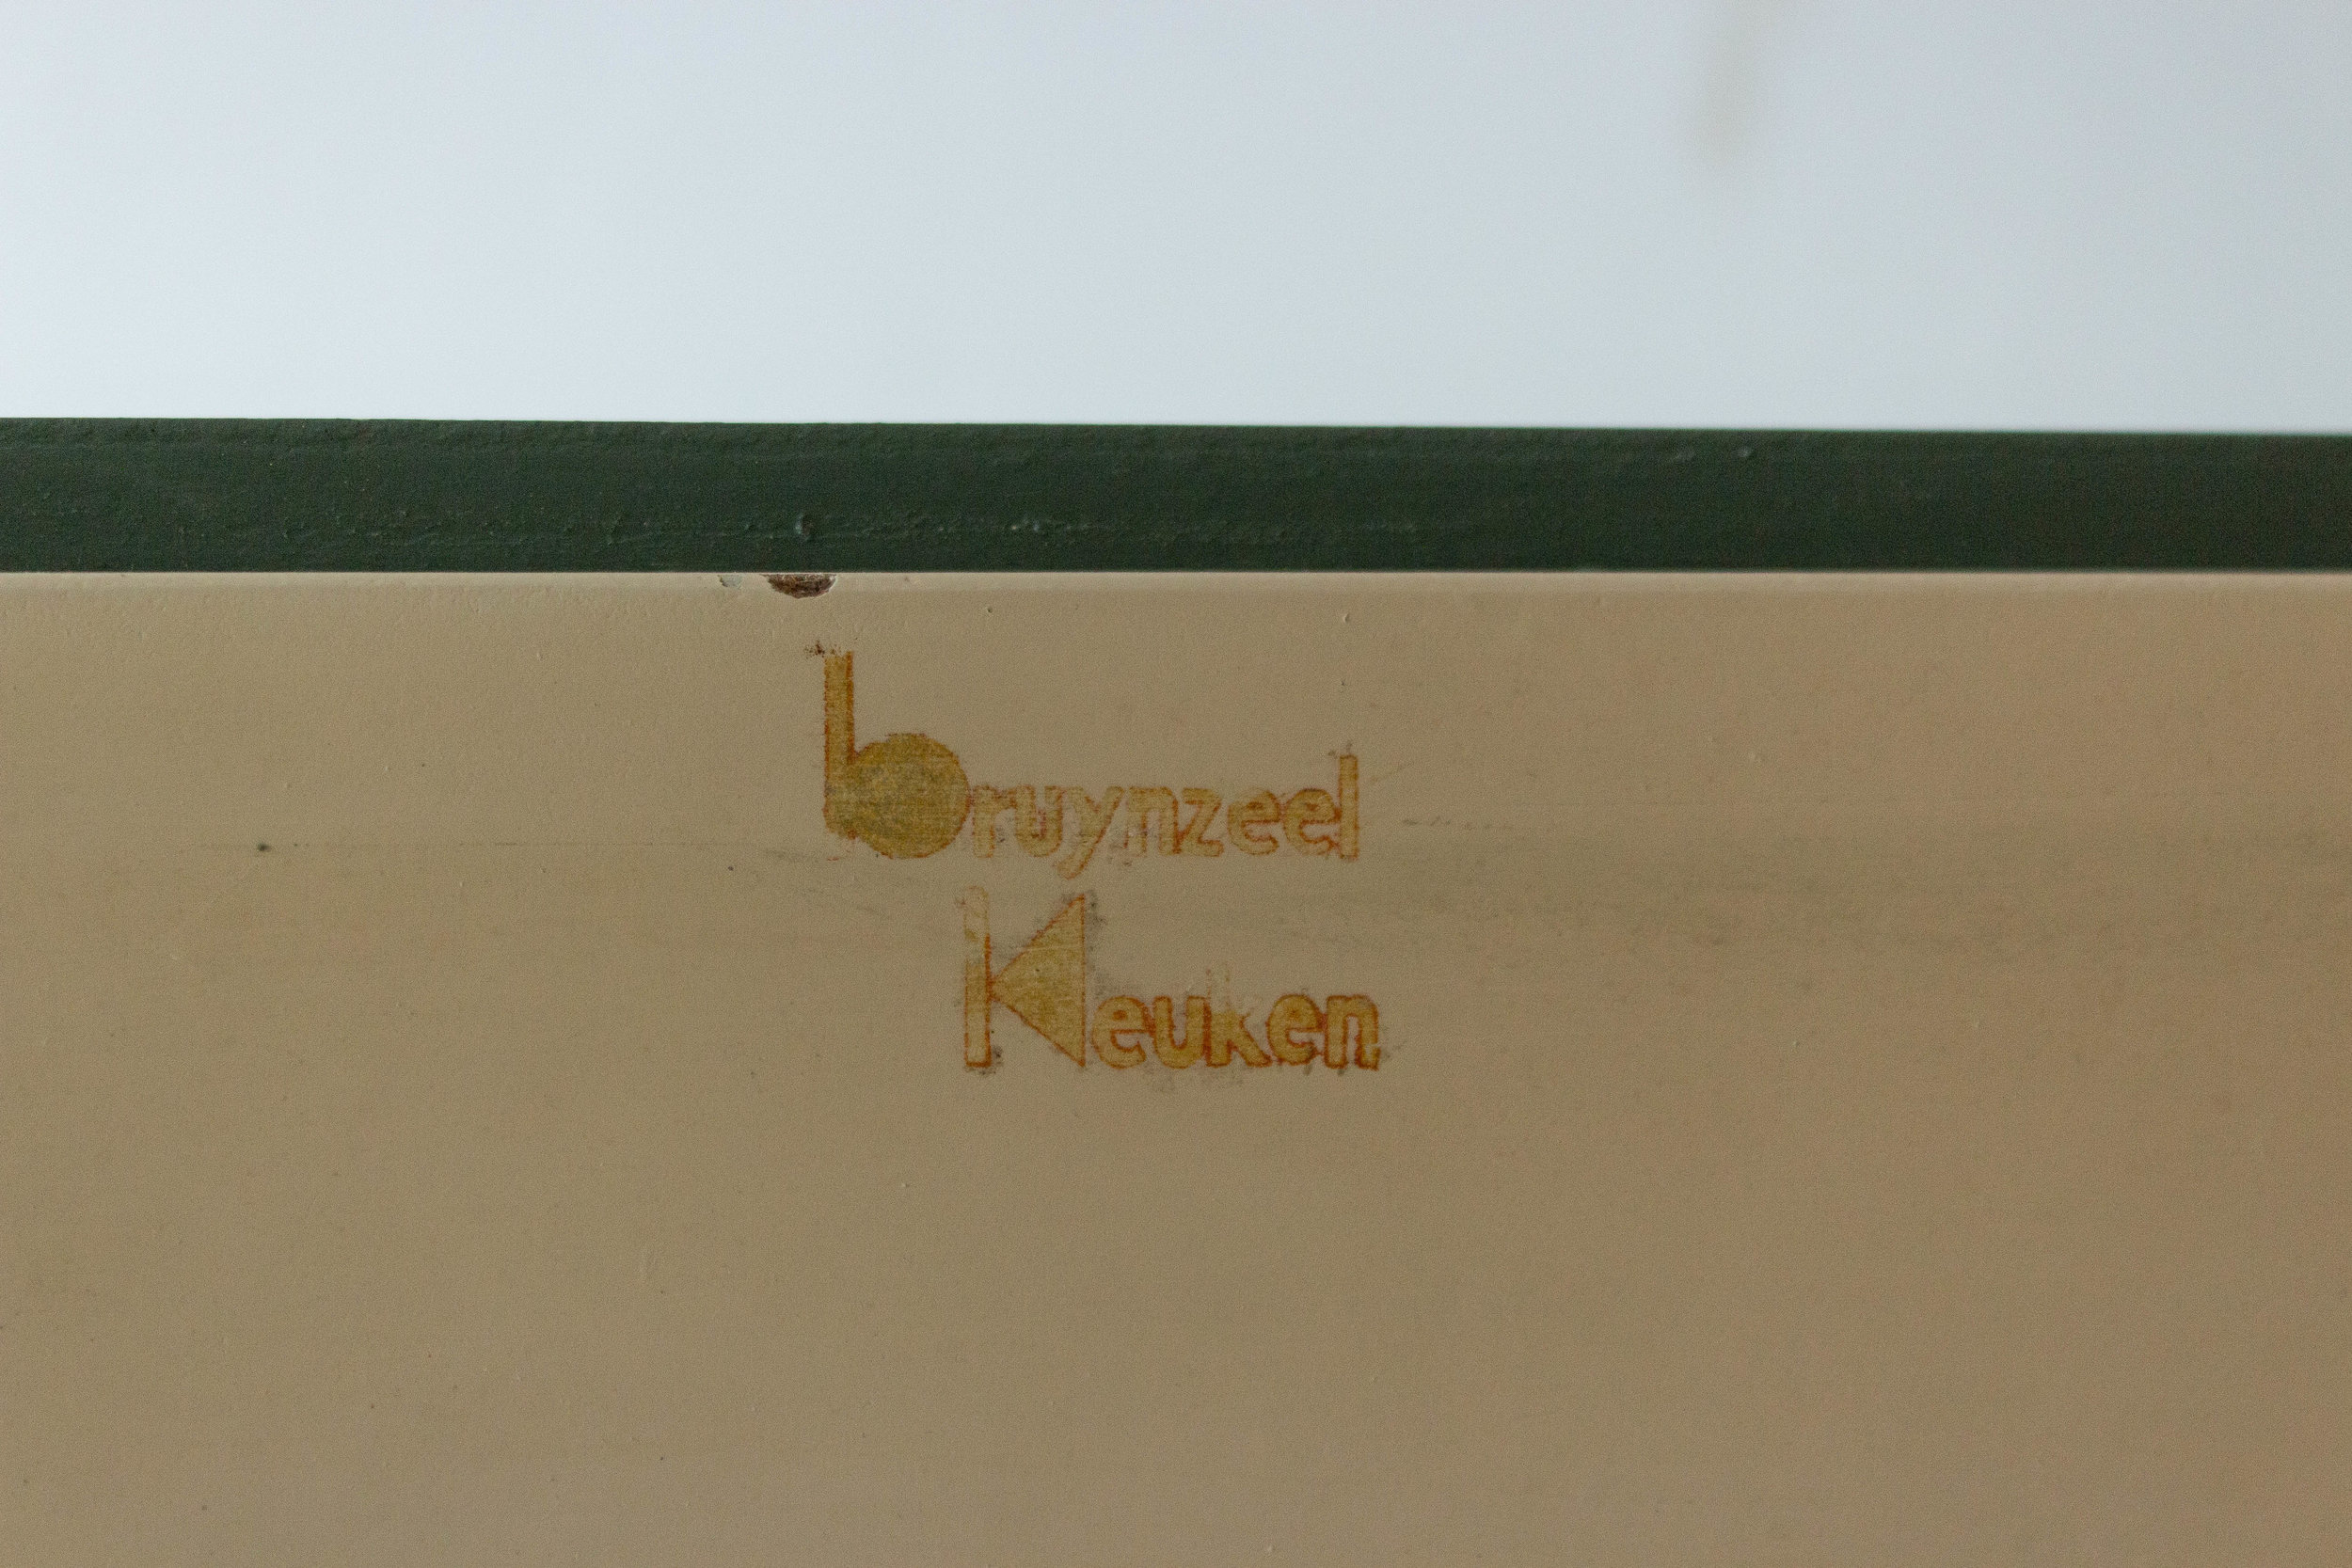 6035 - Dennengroen wadkastje met houten knop-3.jpg